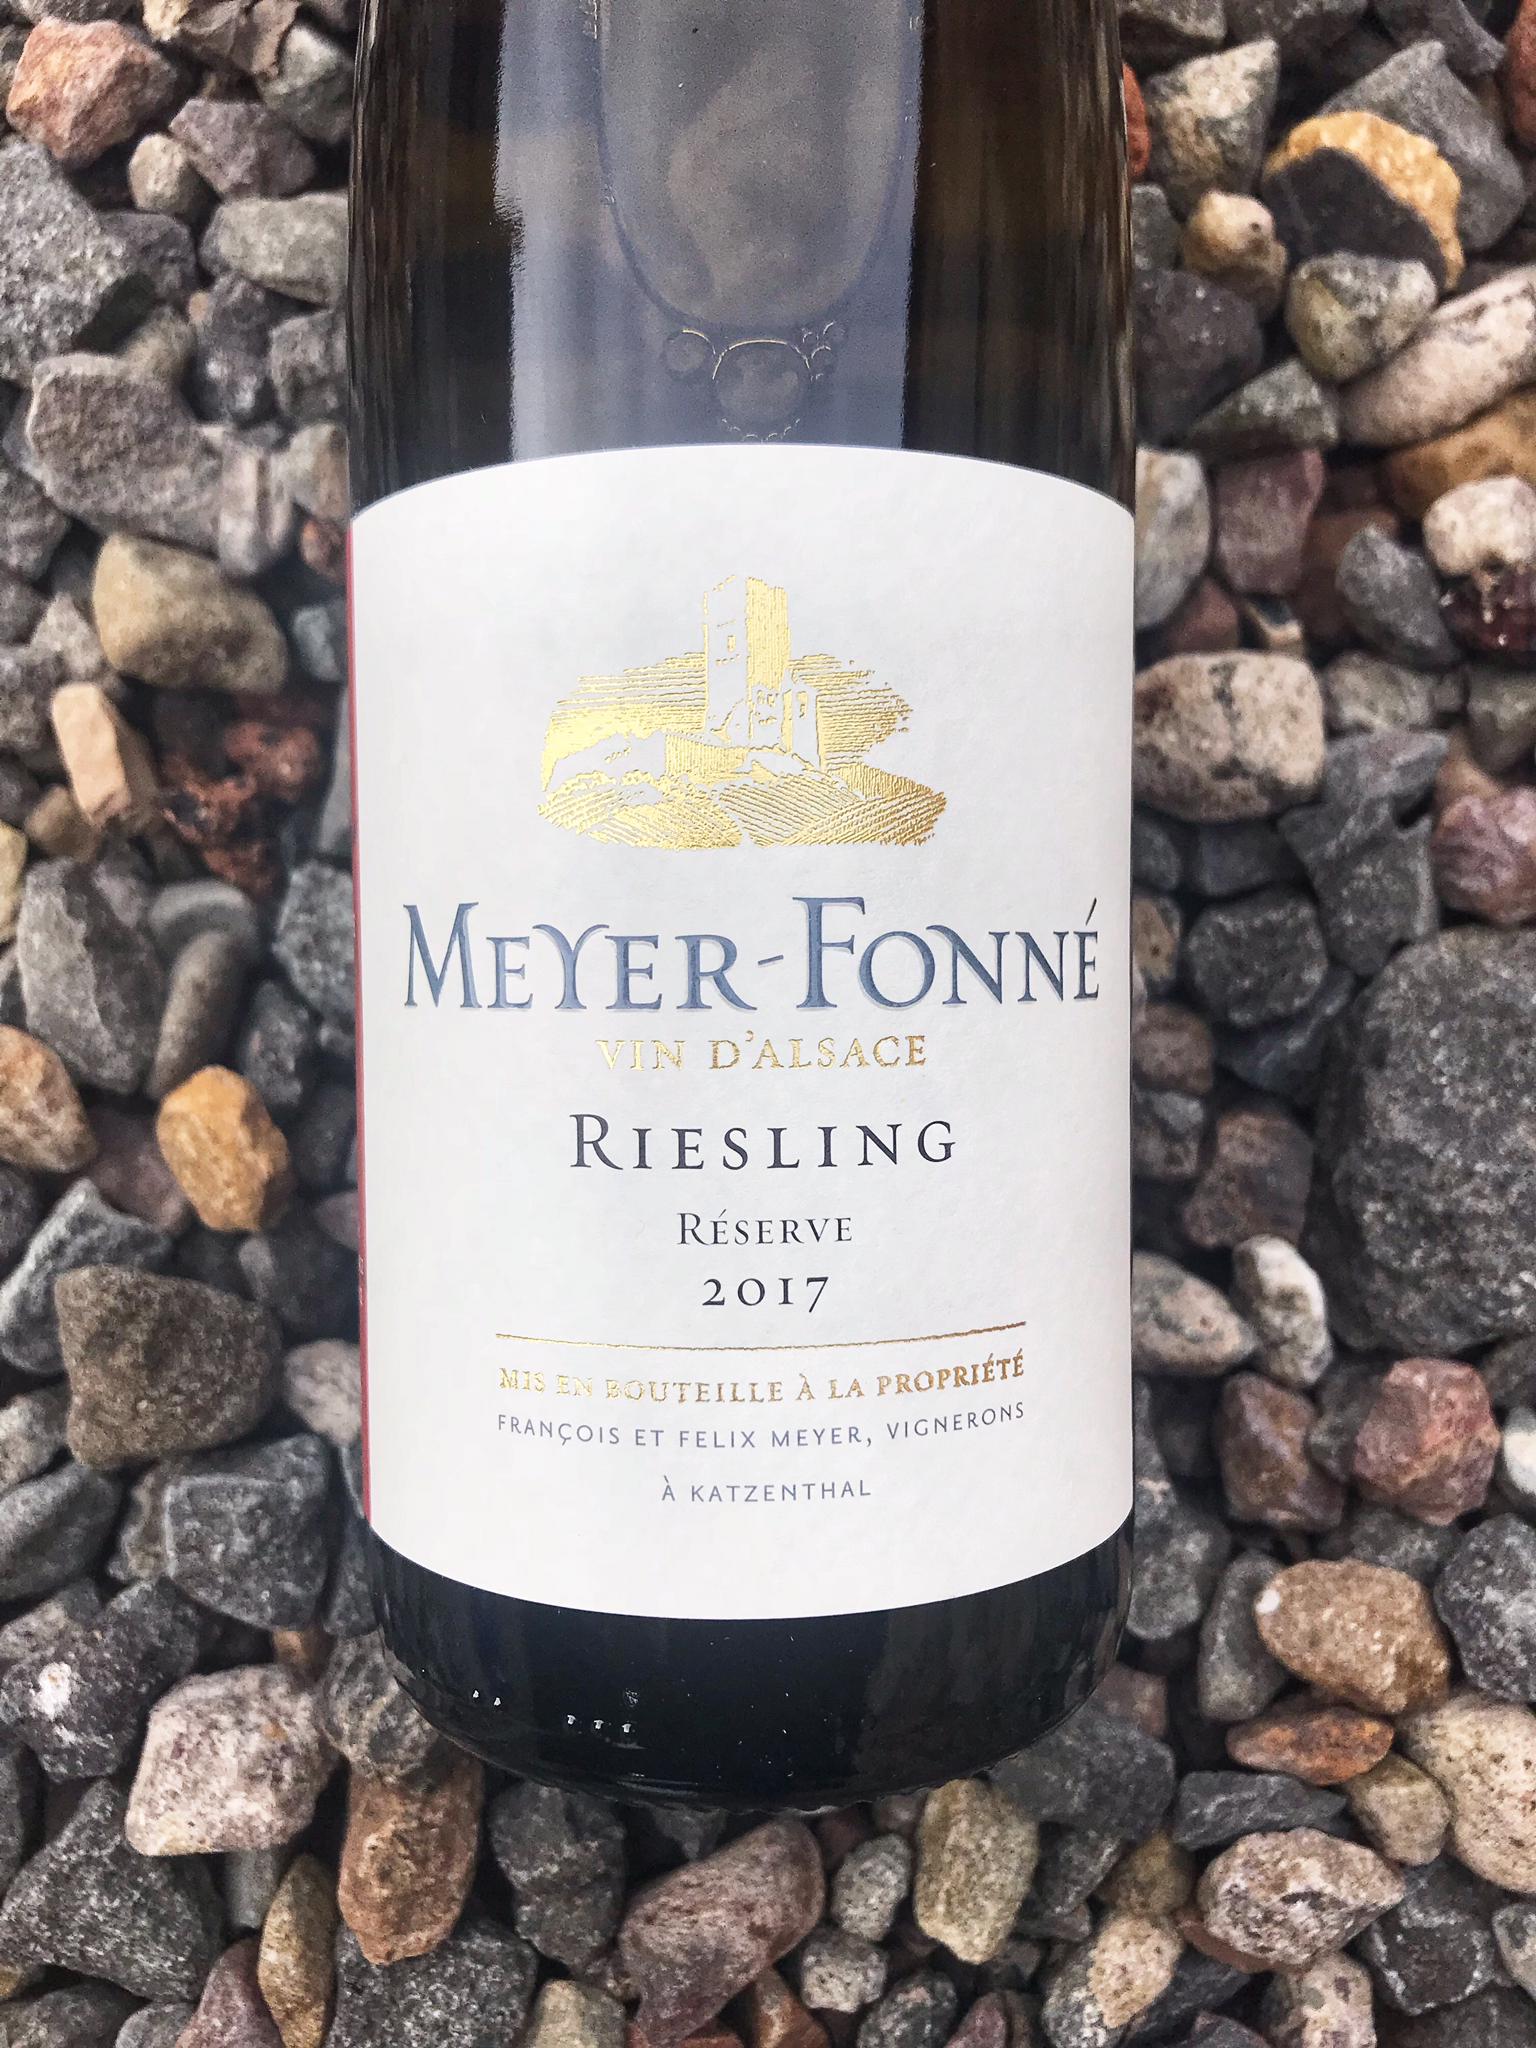 Meyer Fonne Riesling Reserve 2017 00243